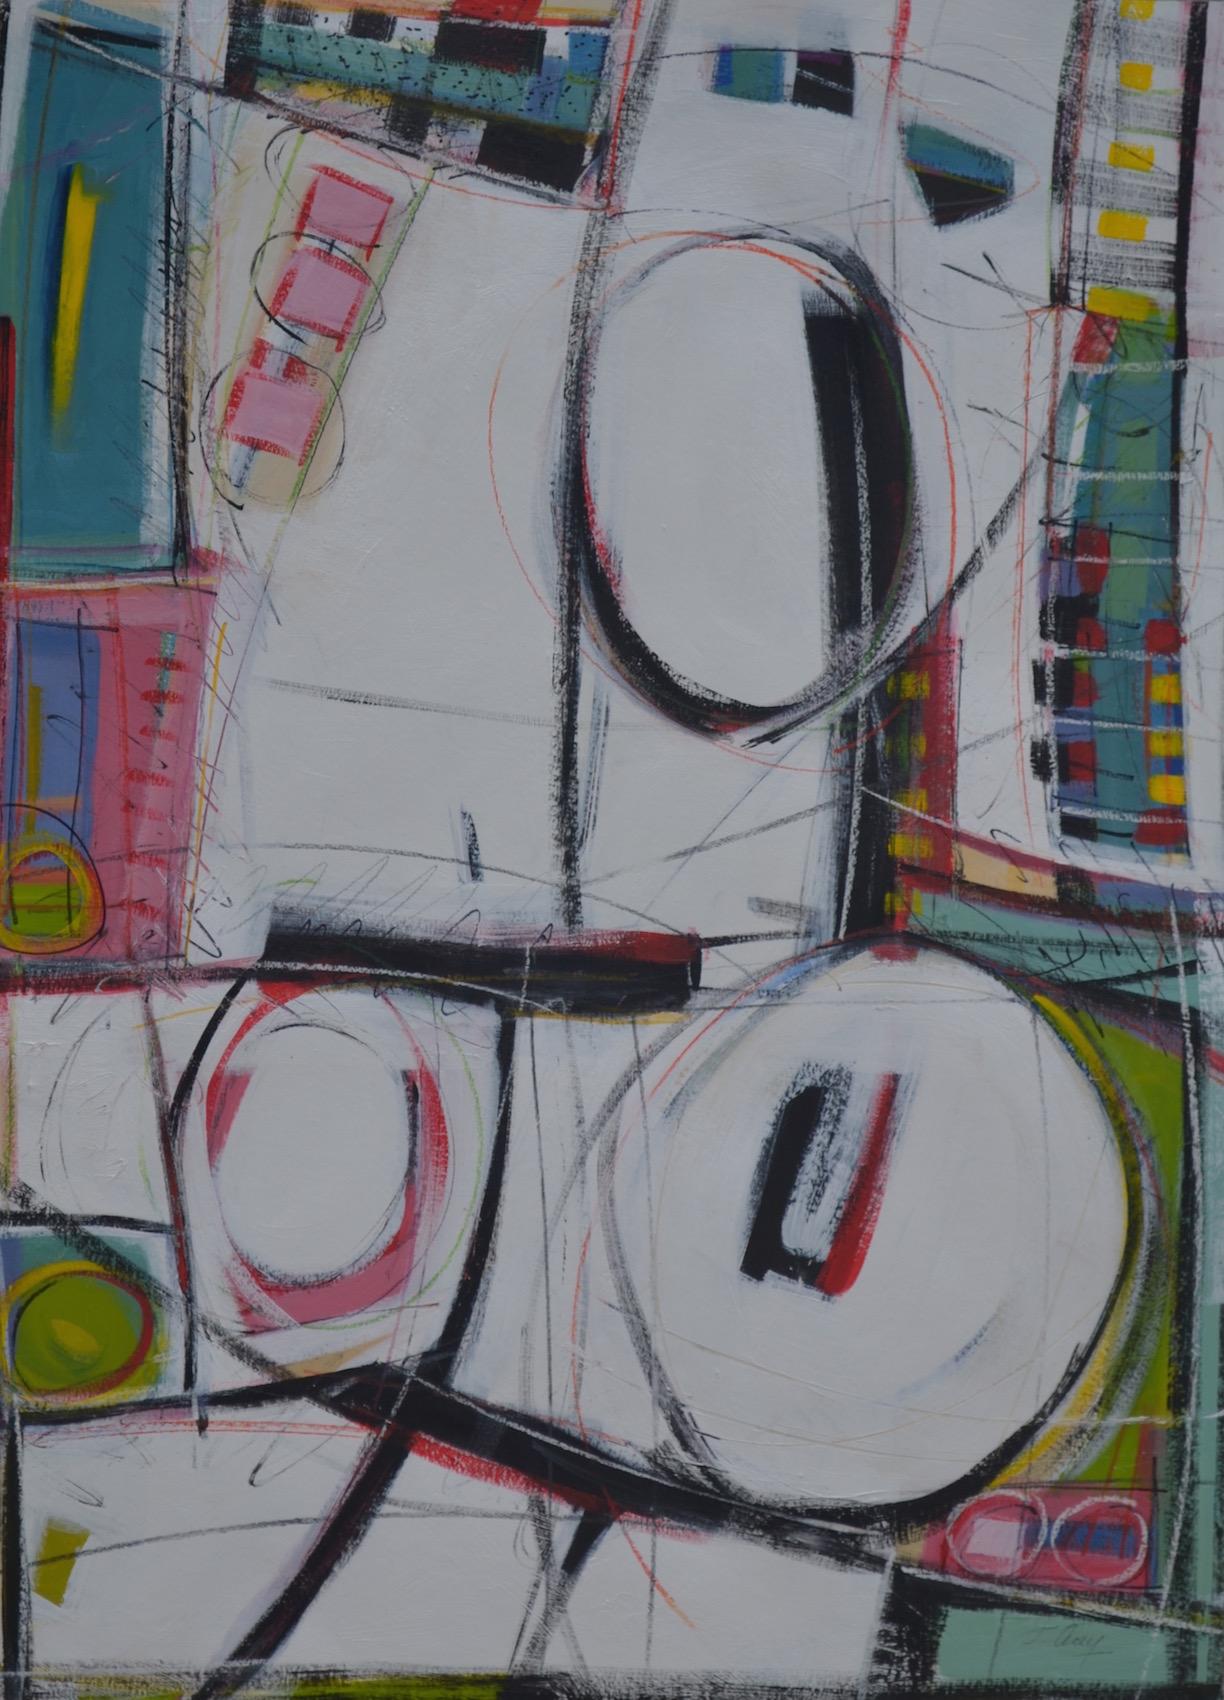 """Swing"" [improvisation] No. 4, 2017"